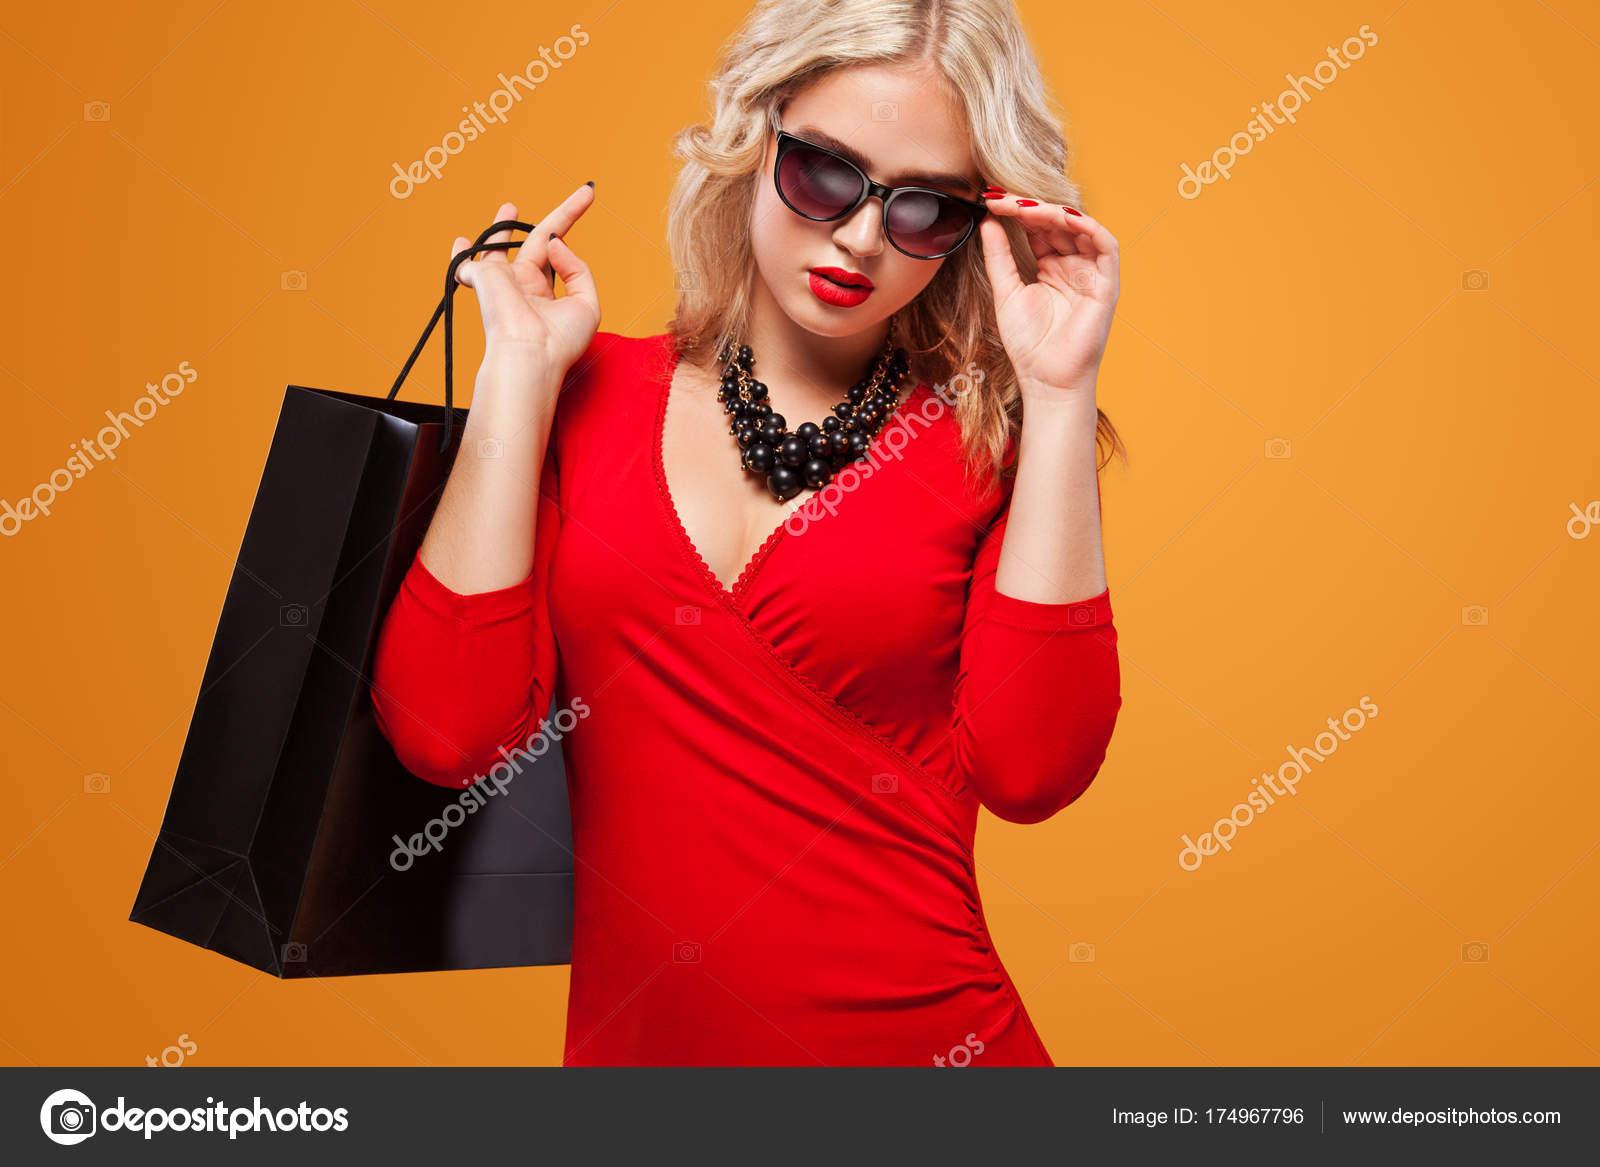 04f9d87a6d Όμορφη νεαρή γυναίκα κάνει ψώνια για Μαύρη Παρασκευή διακοπών. Κορίτσι με  τσάντα σε lgiht φόντο — Εικόνα από ...